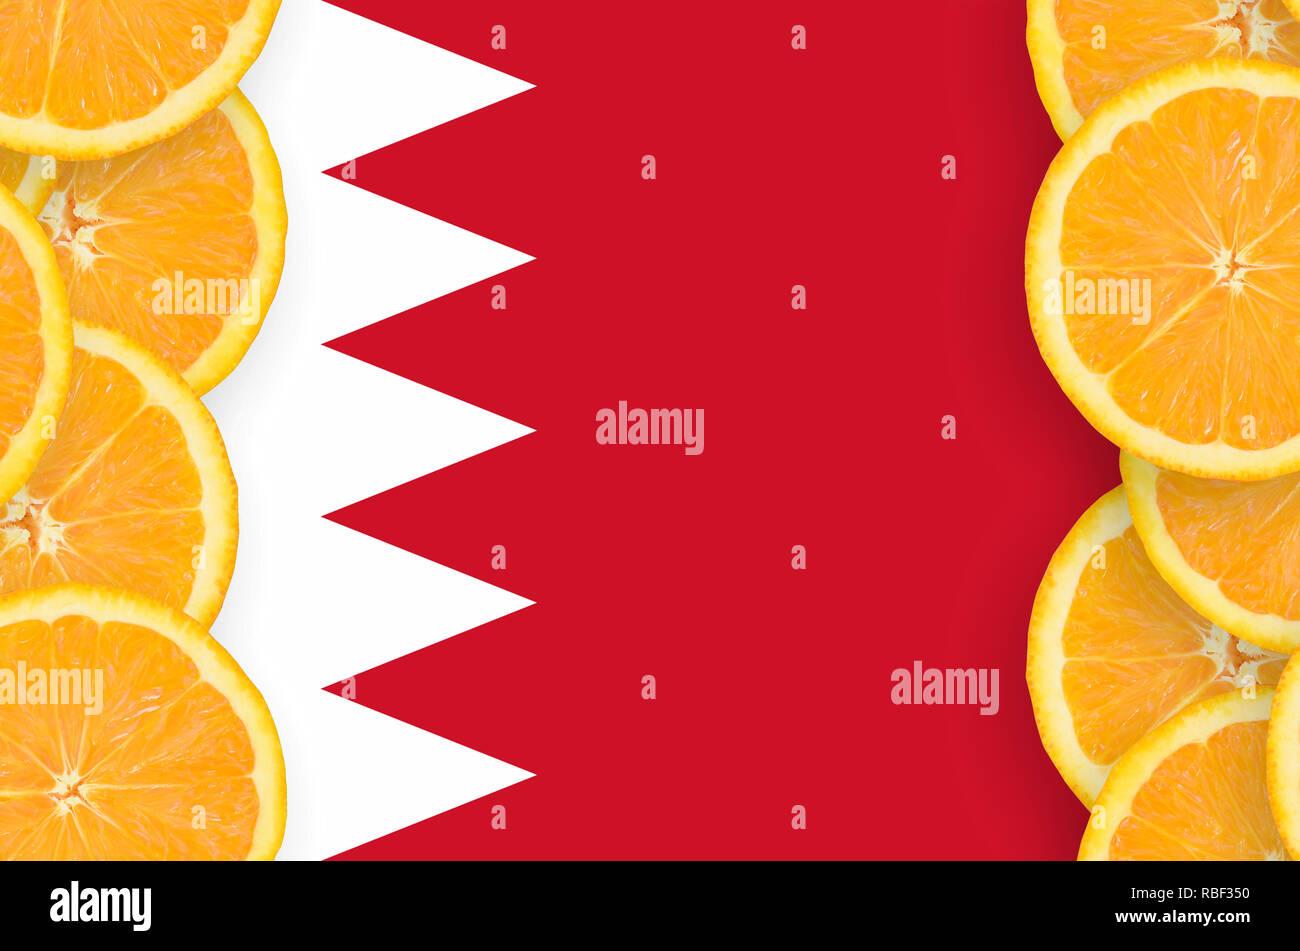 Bahrain flag in vertical frame of orange citrus fruit slices